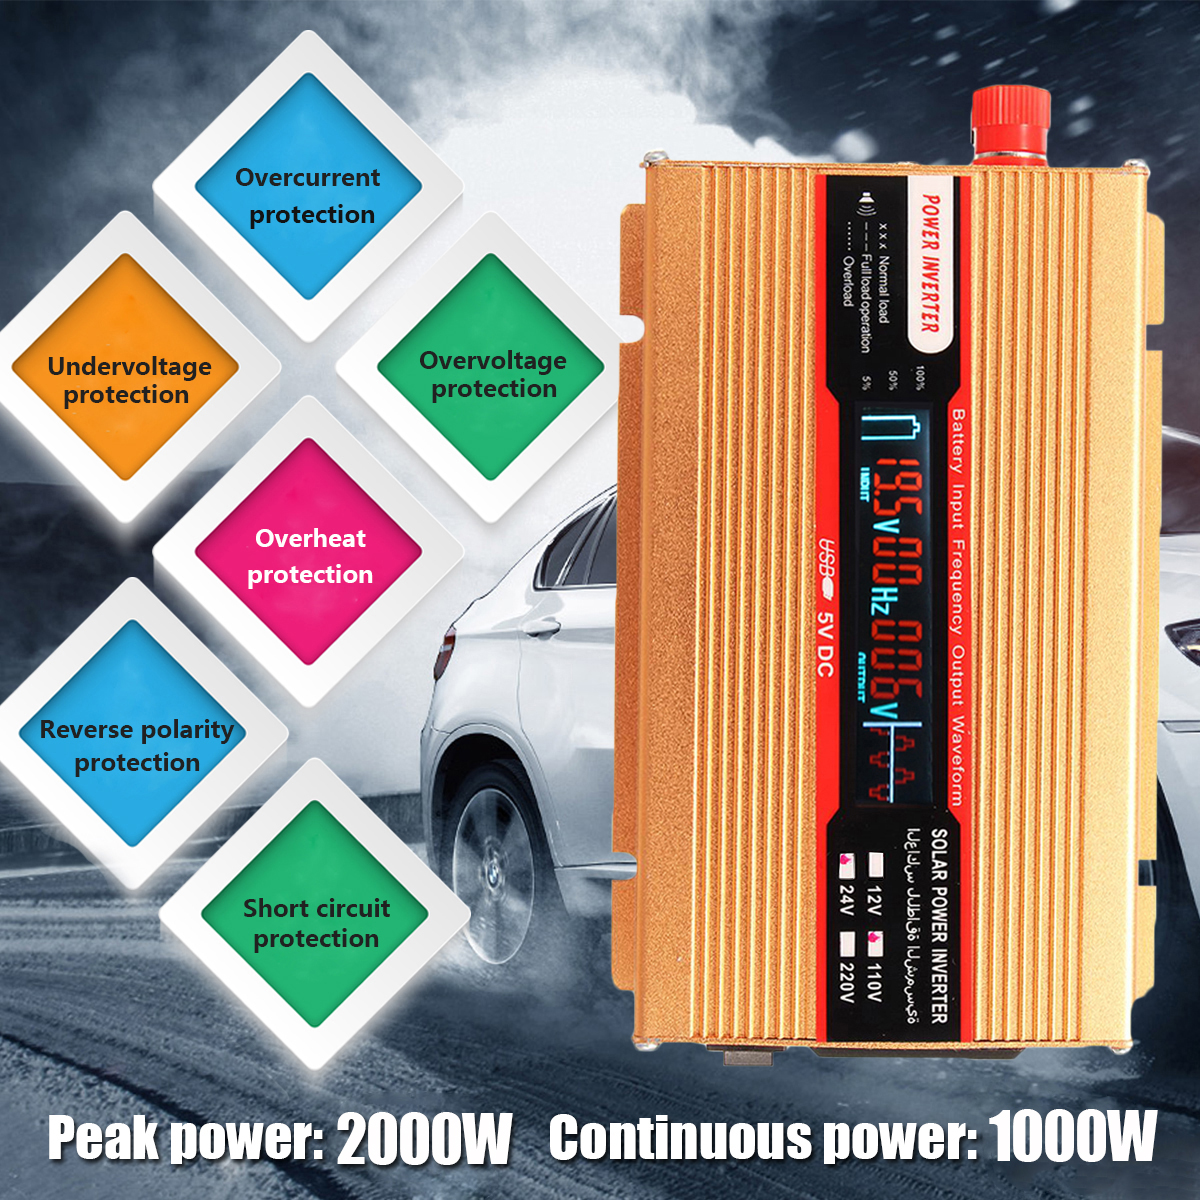 Car Power Inverter USB PEAK 2000W 12/24V To AC 220/110V Modified Sine Wave Converter for Various Appliances Voltage Transformer peak 5000w 12 24v to ac 220 110v car power inverter usb modified sine wave converter voltage transformer for various appliances